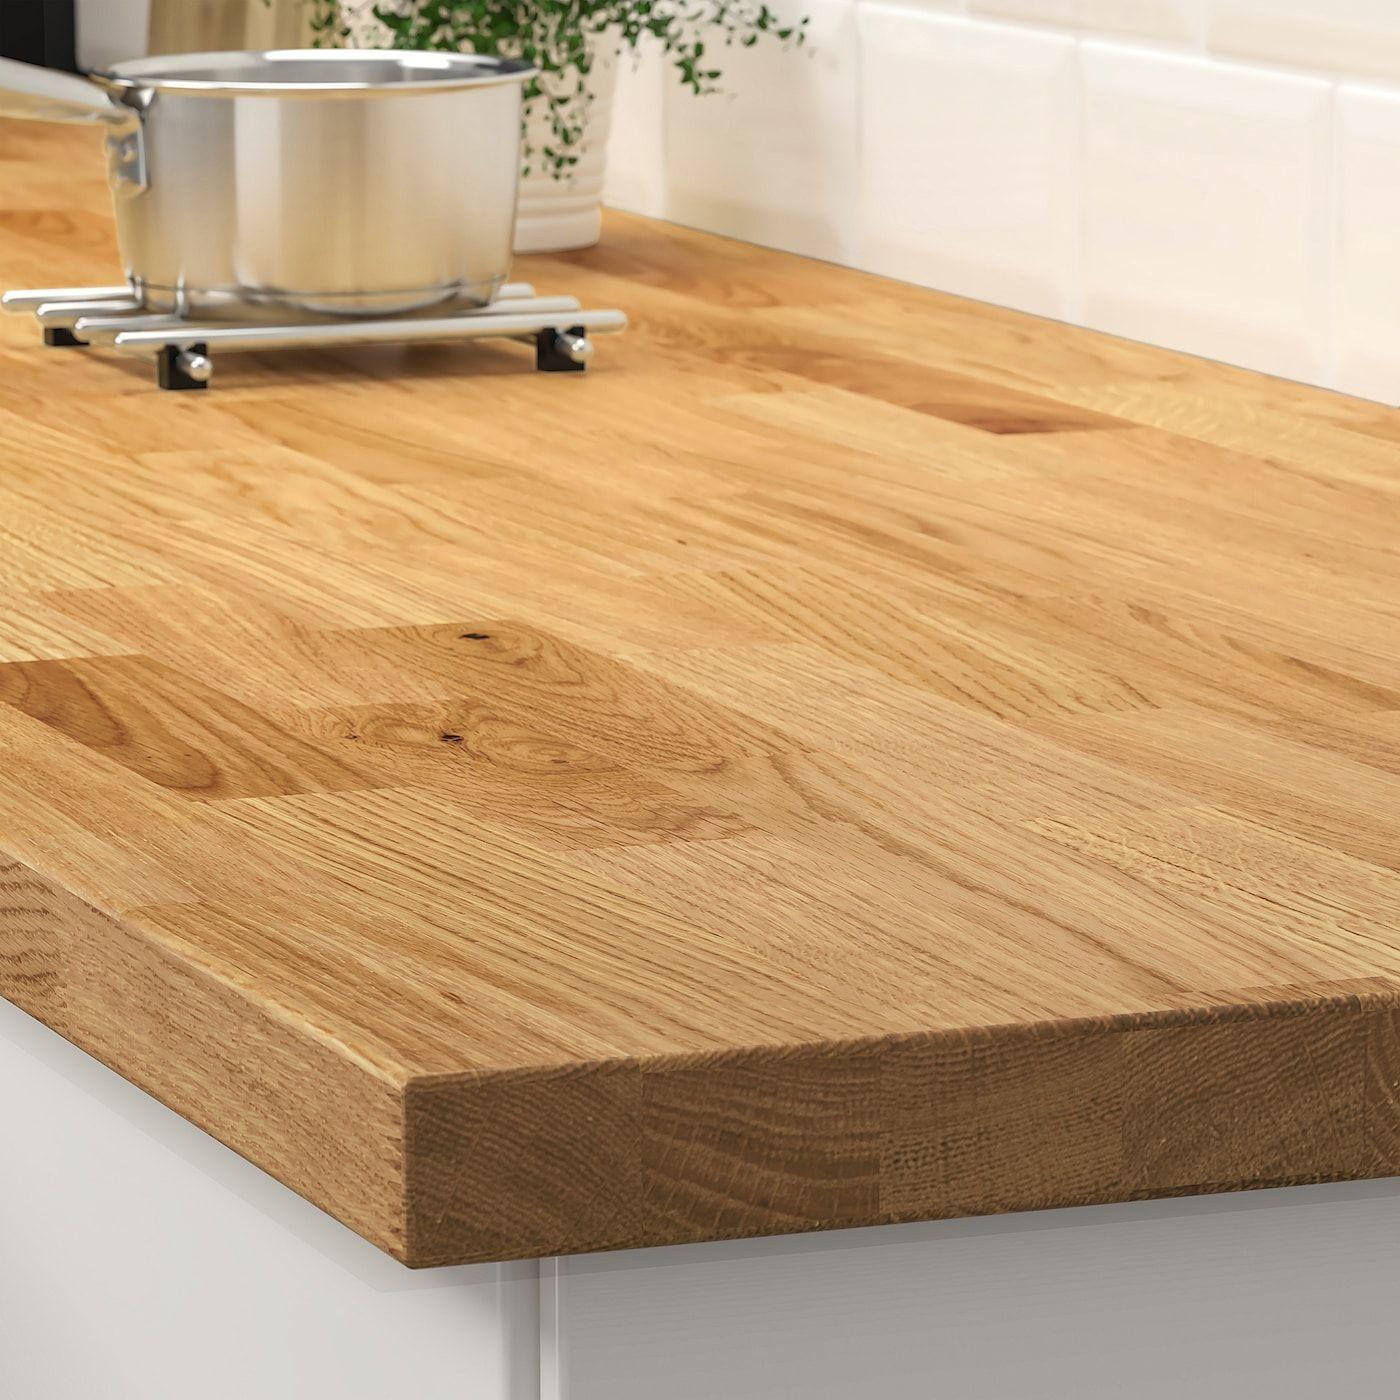 Karlby Arbeitsplatte Eiche Furnier Ikea Osterreich In 2020 Karlby Countertop Ikea Wood Countertops Countertops